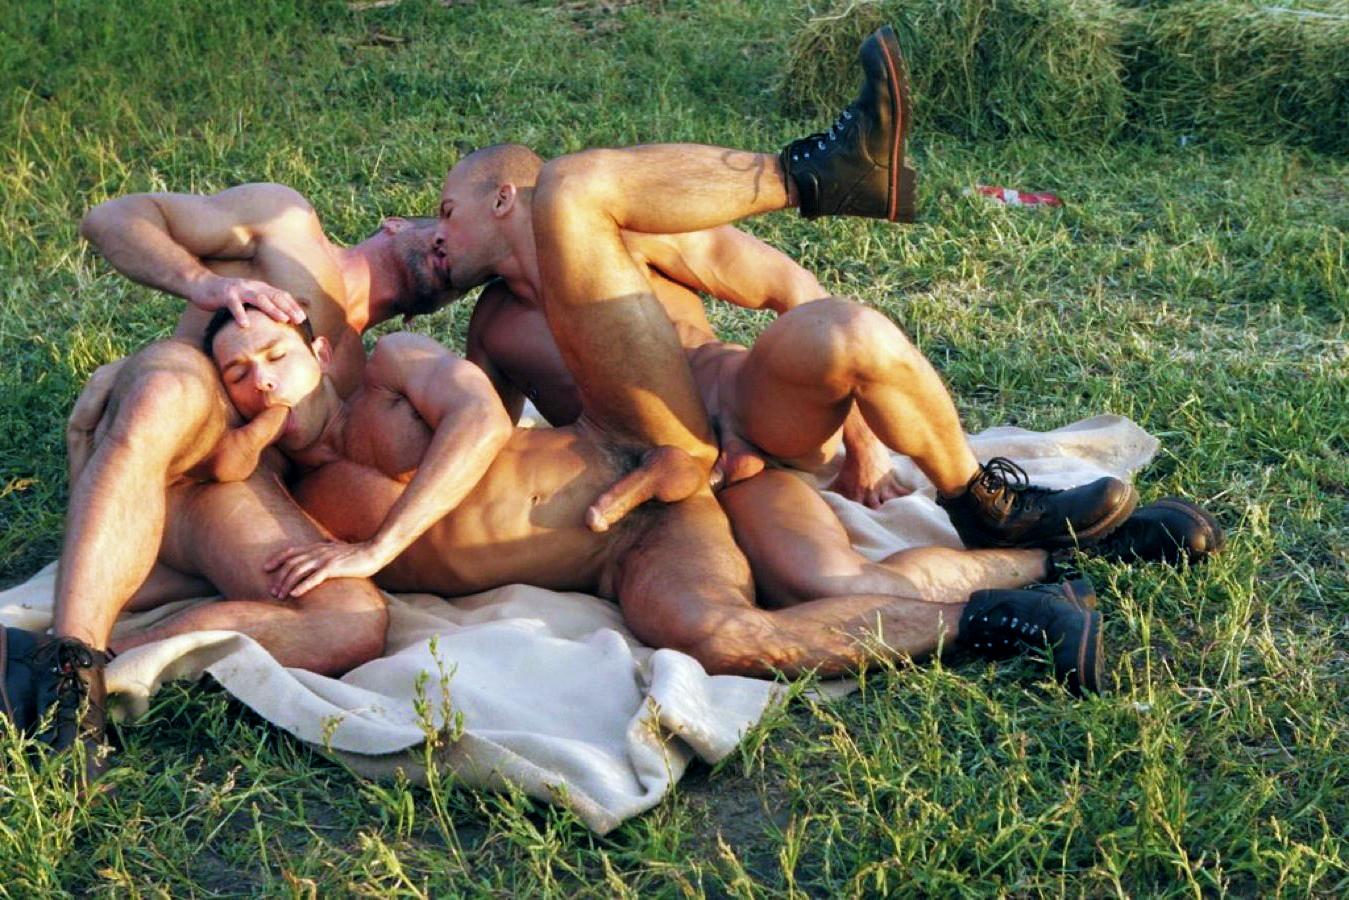 girls nude at pajama party